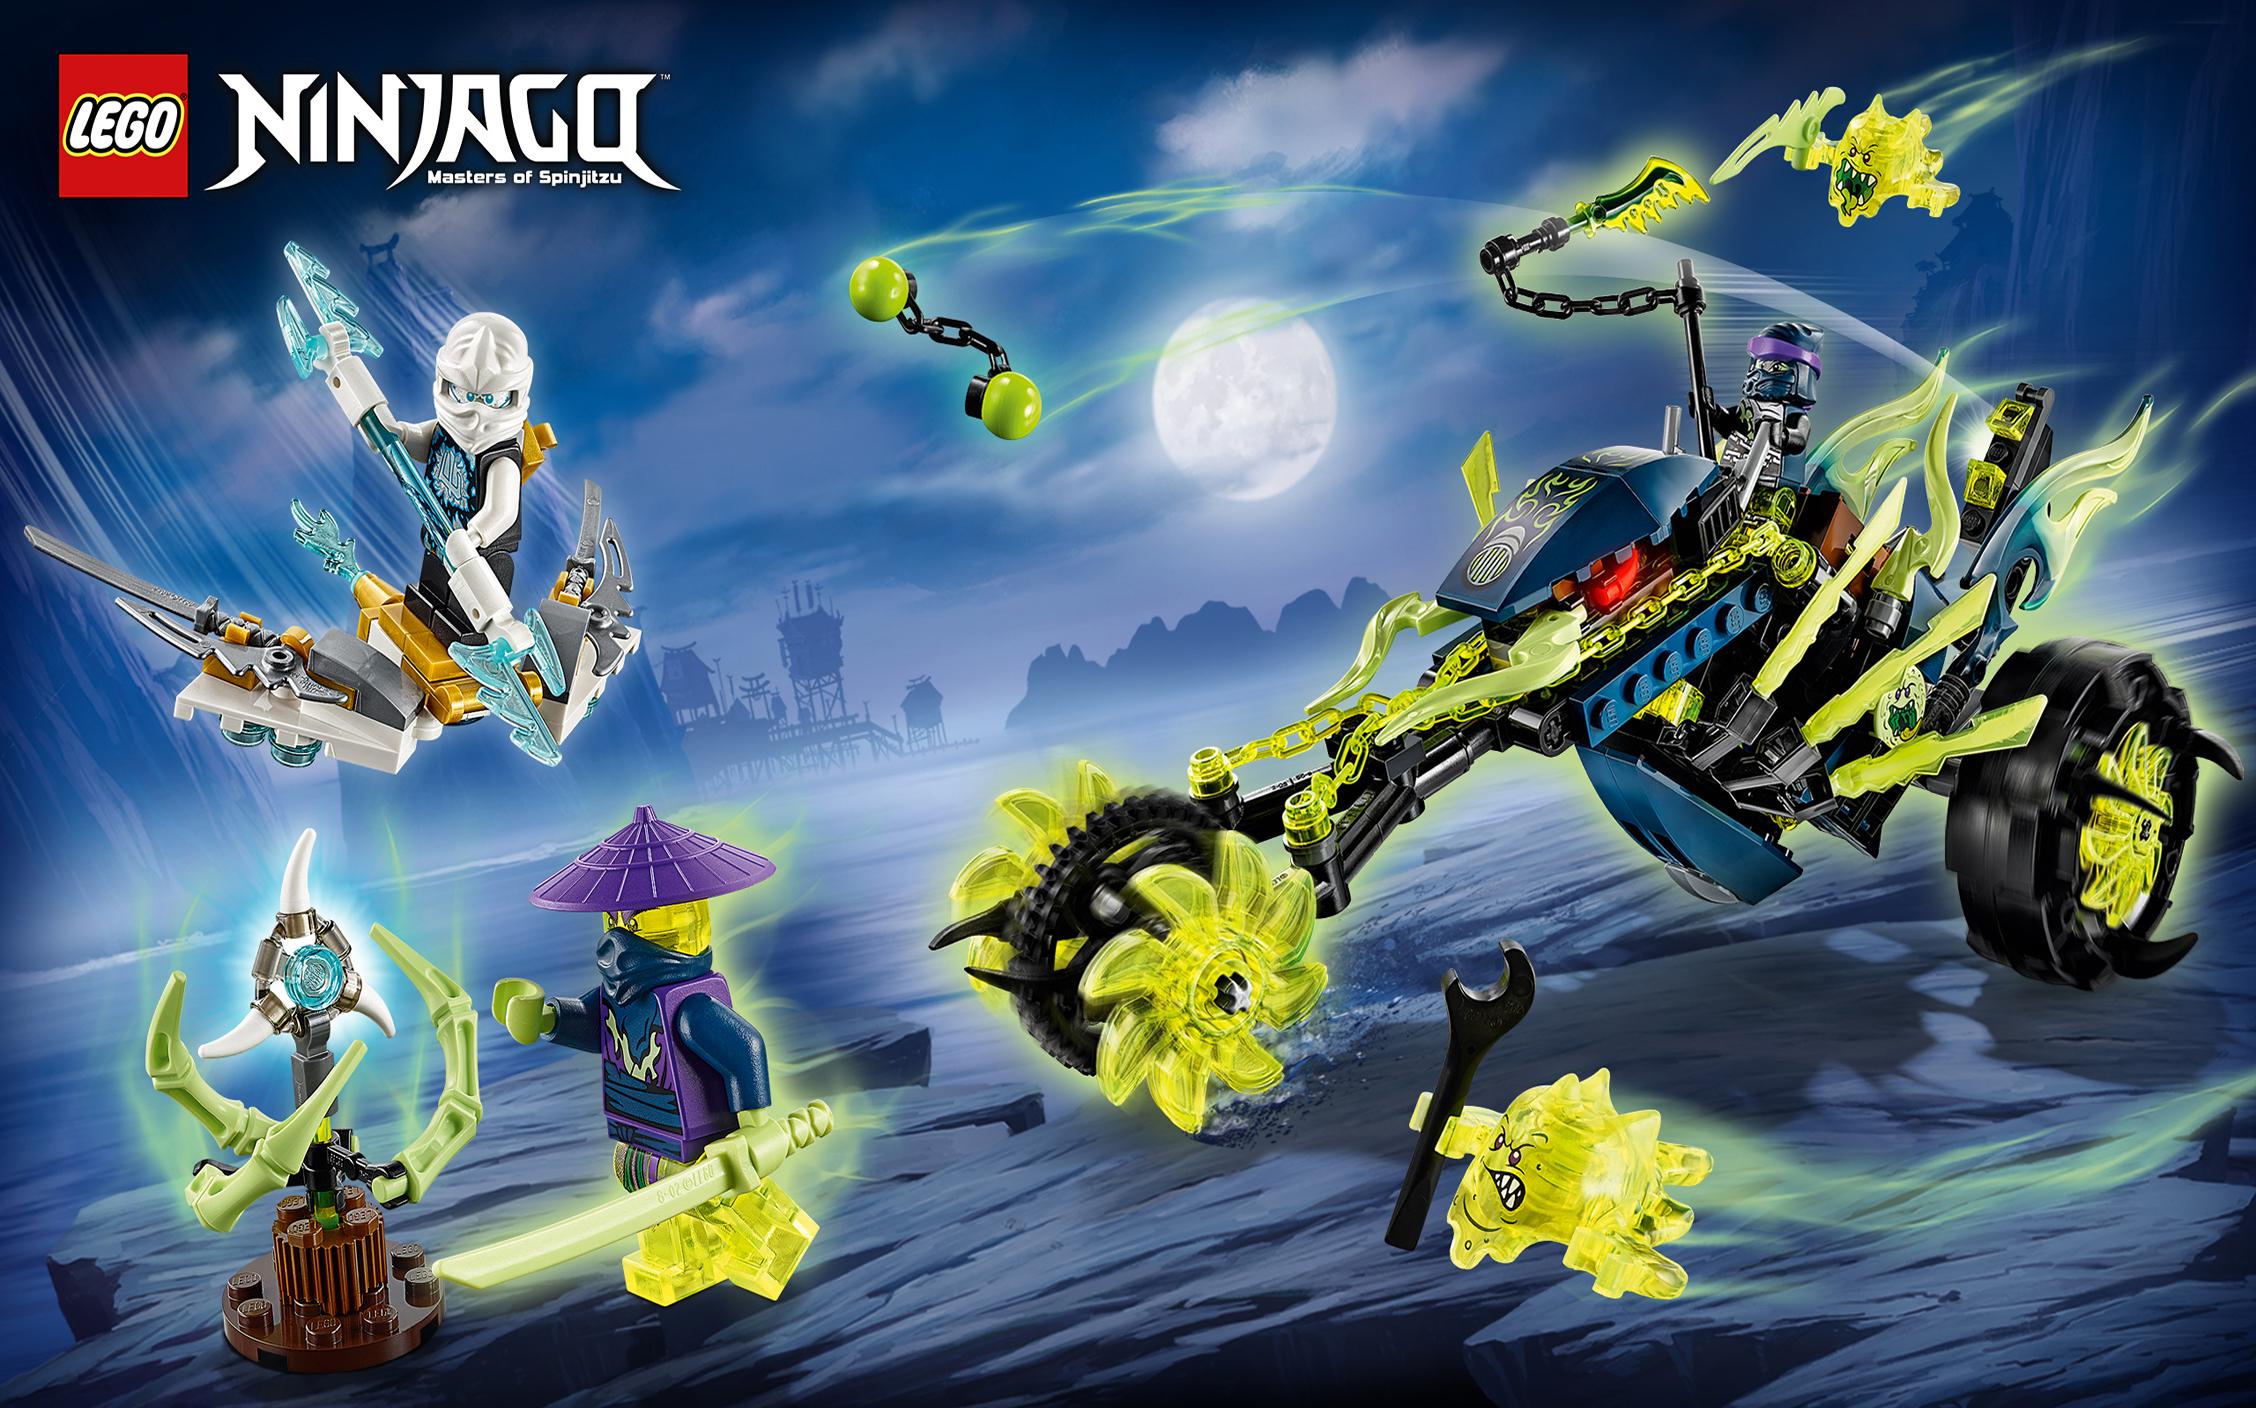 70730   Wallpaper   Activities   Ninjago LEGOcom 2256x1408